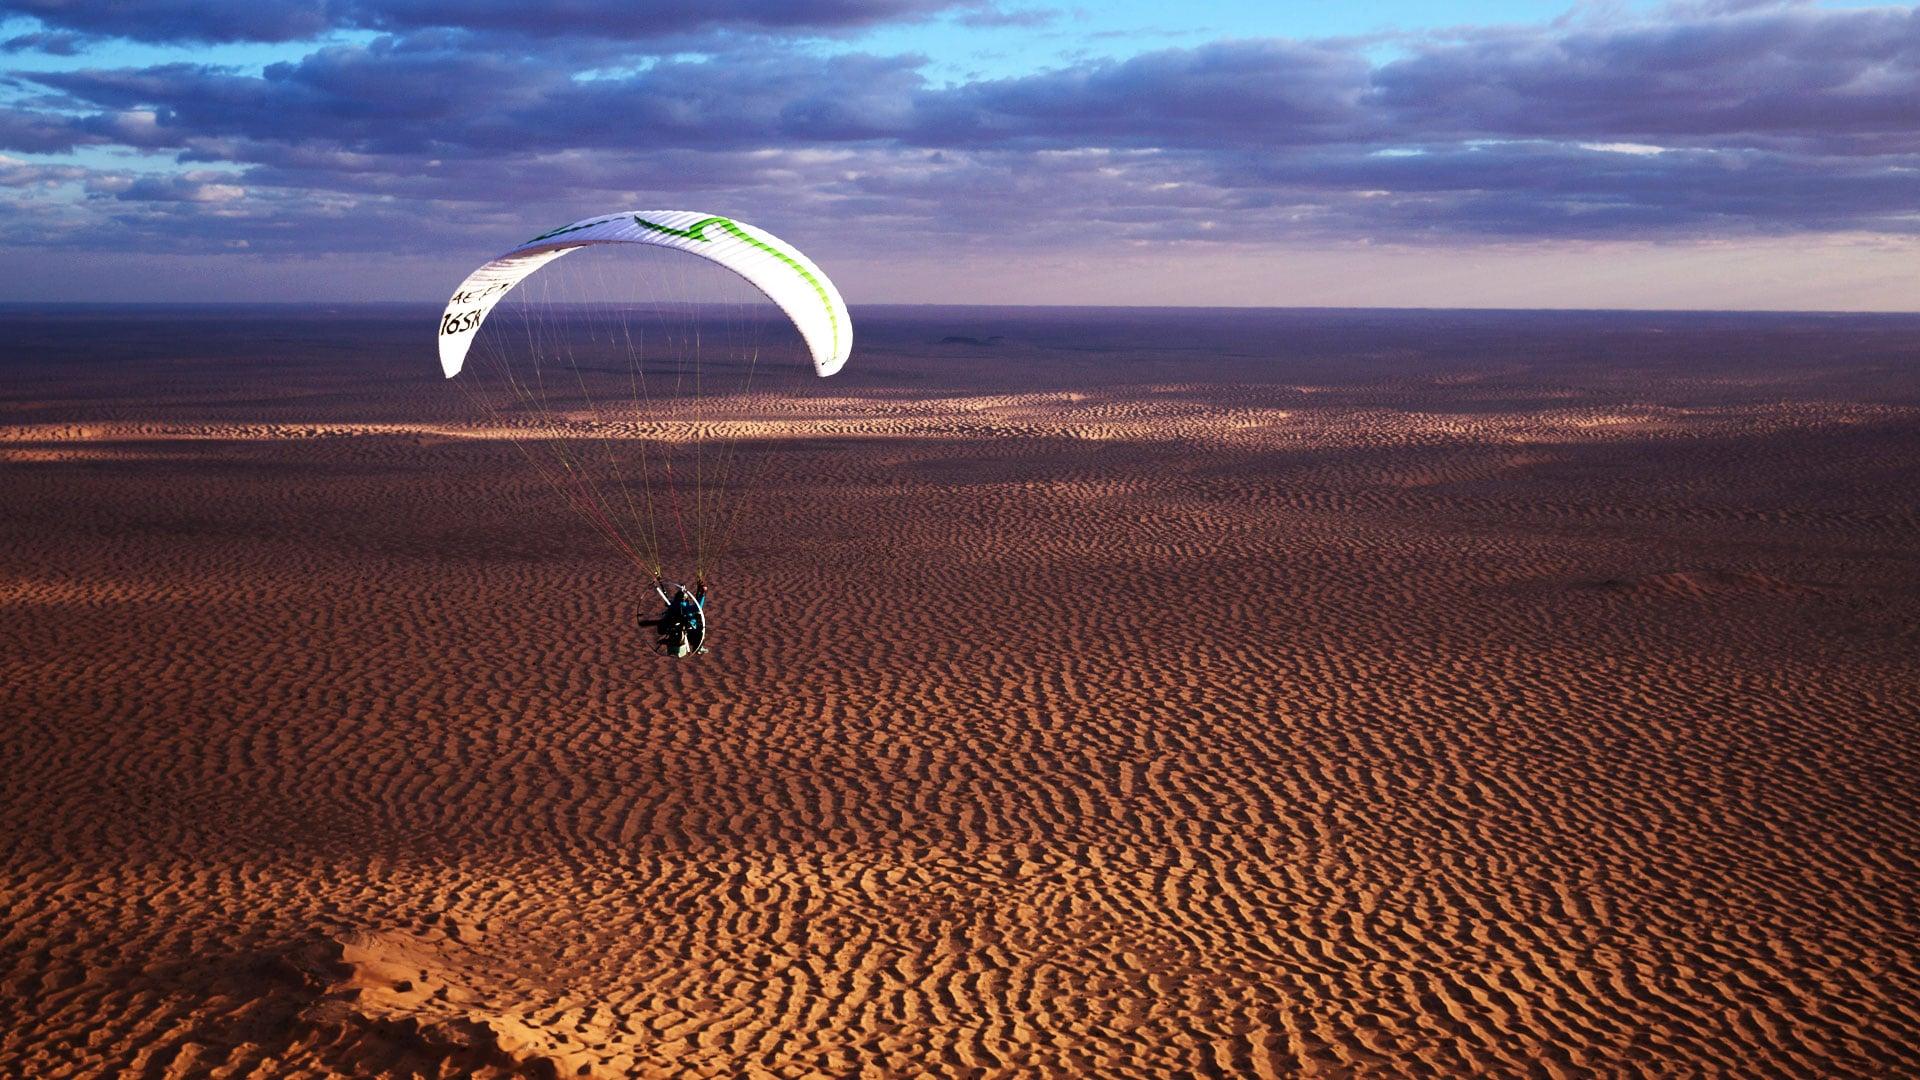 flying tunisia fond d'écran en paramoteur ulm